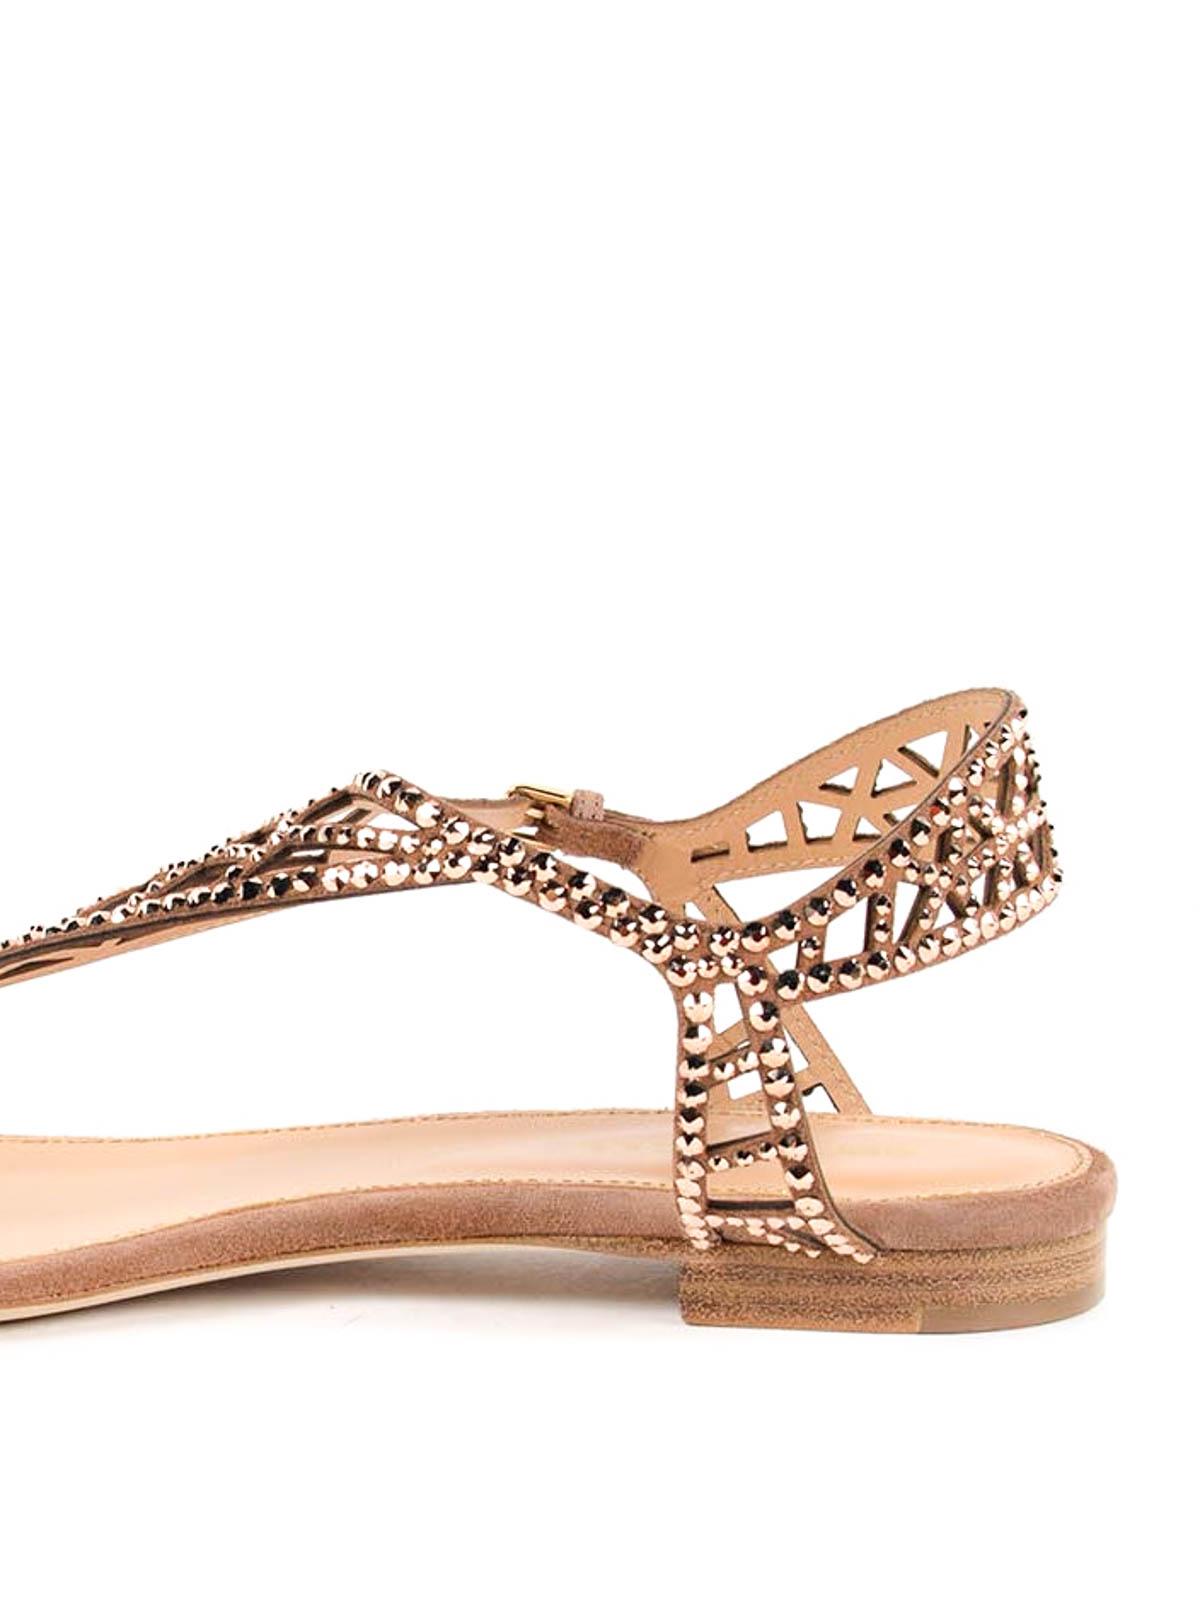 tresor flat sandals by sergio rossi sandals ikrix. Black Bedroom Furniture Sets. Home Design Ideas